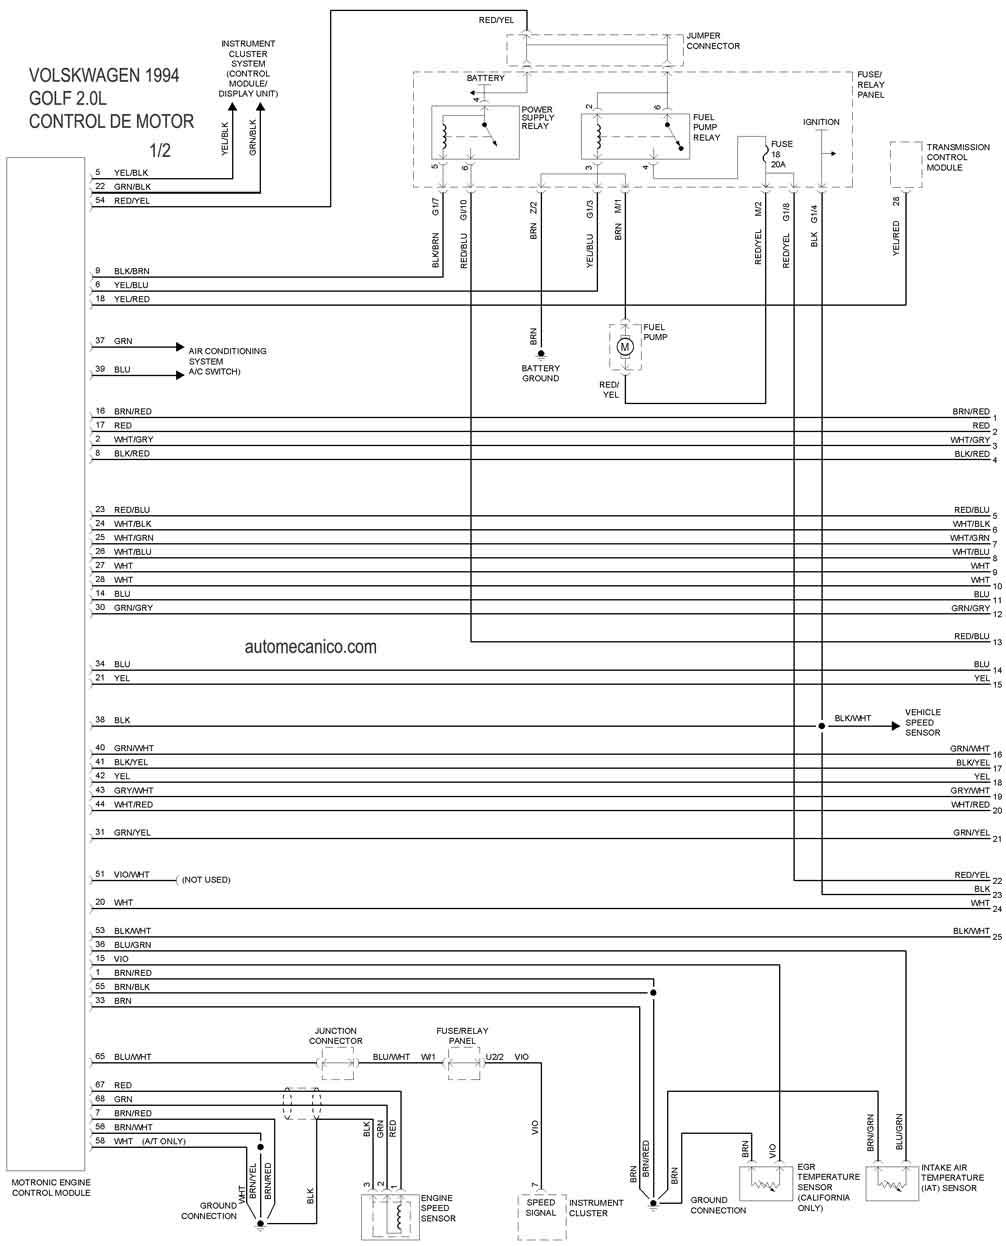 1997 ford ranger wiring diagram facbooik com 94 Ford Ranger Radio Wiring Diagram 1997 ford explorer wiring diagram wiring diagram 94 ford ranger radio wiring diagram